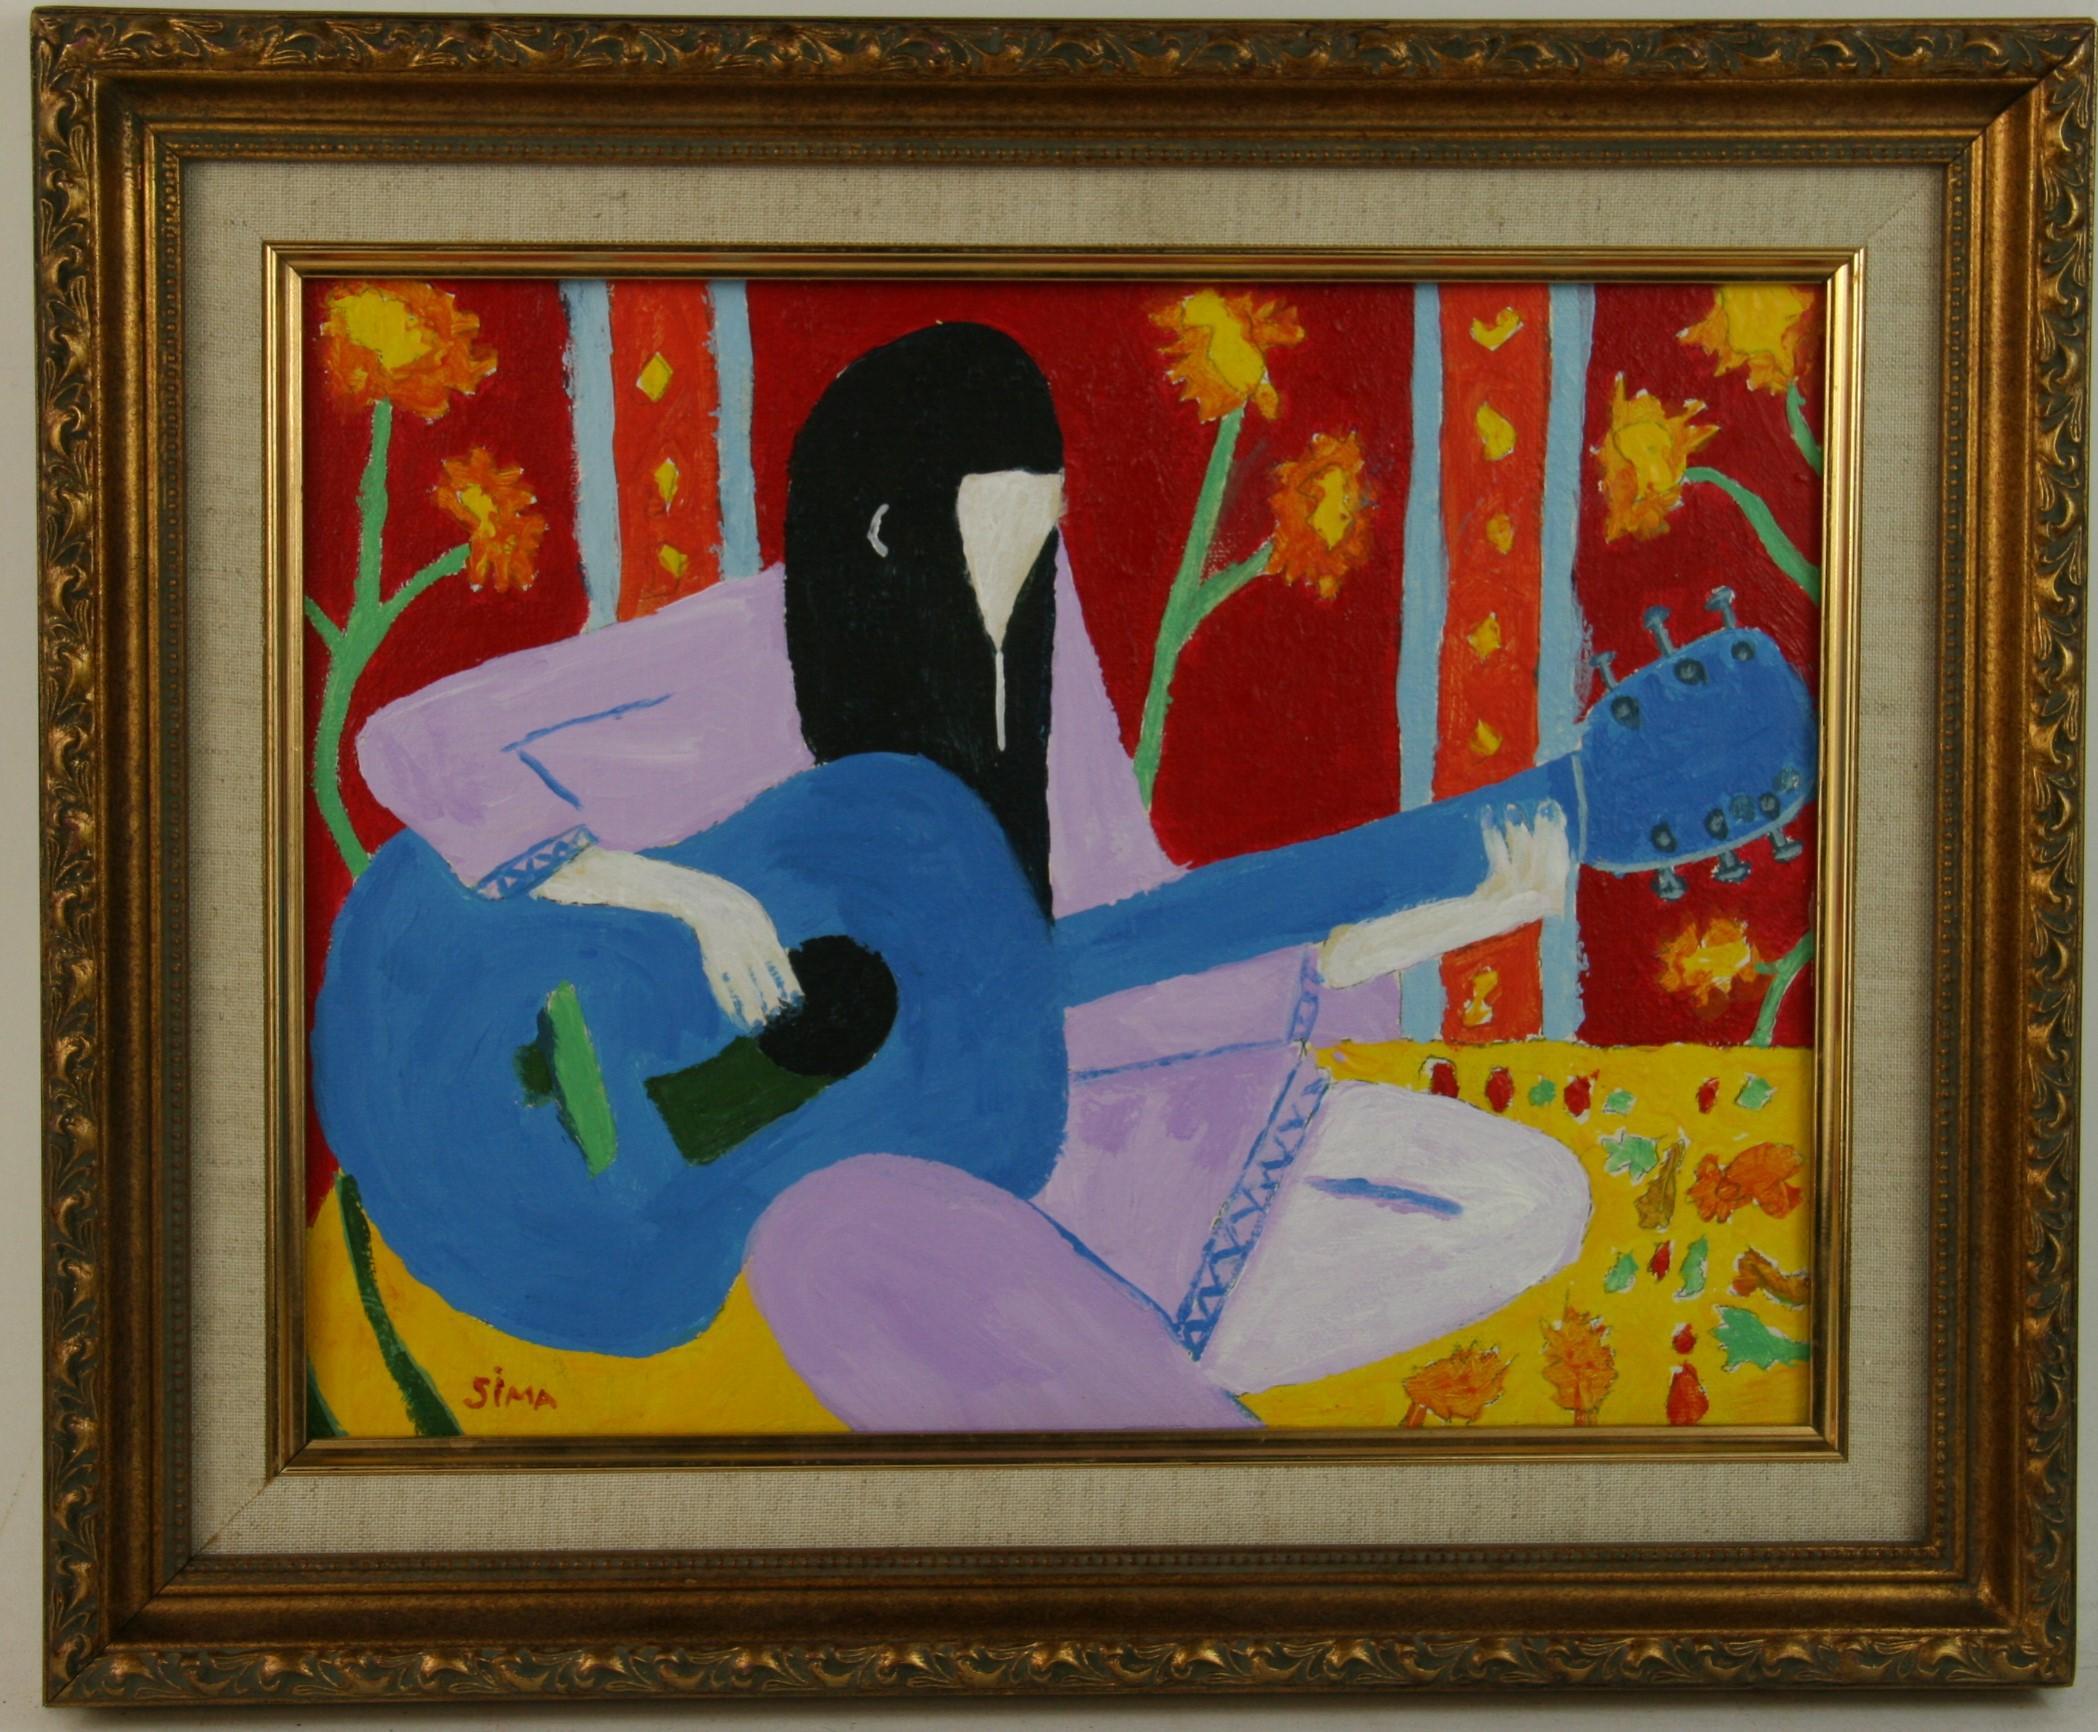 70's Folk Musician Female Figurative Landscape Painting